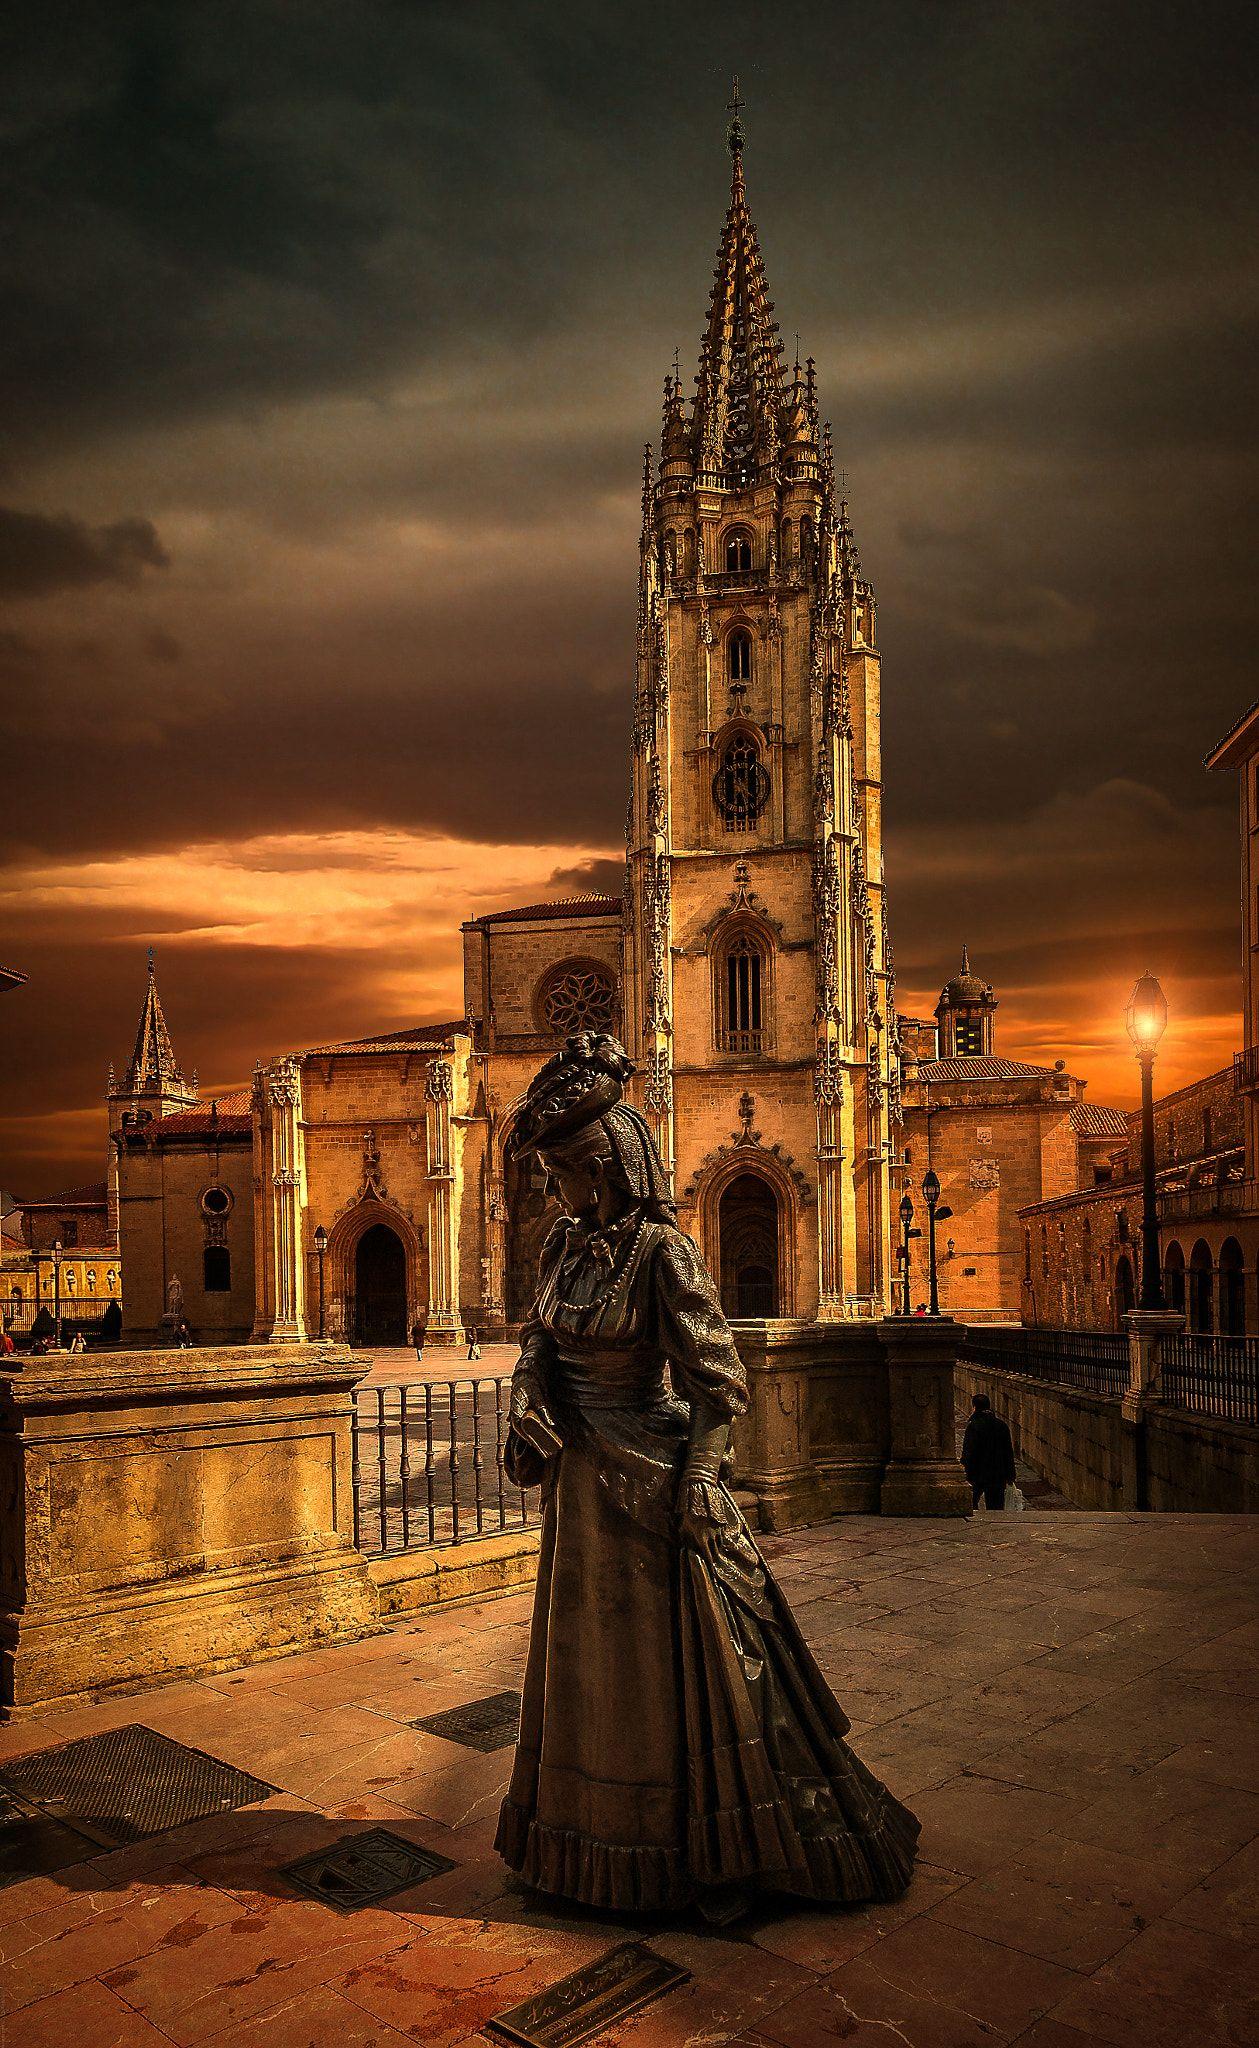 Catedral de San Salvador de Oviedo Gothic Cathedrals Pinterest